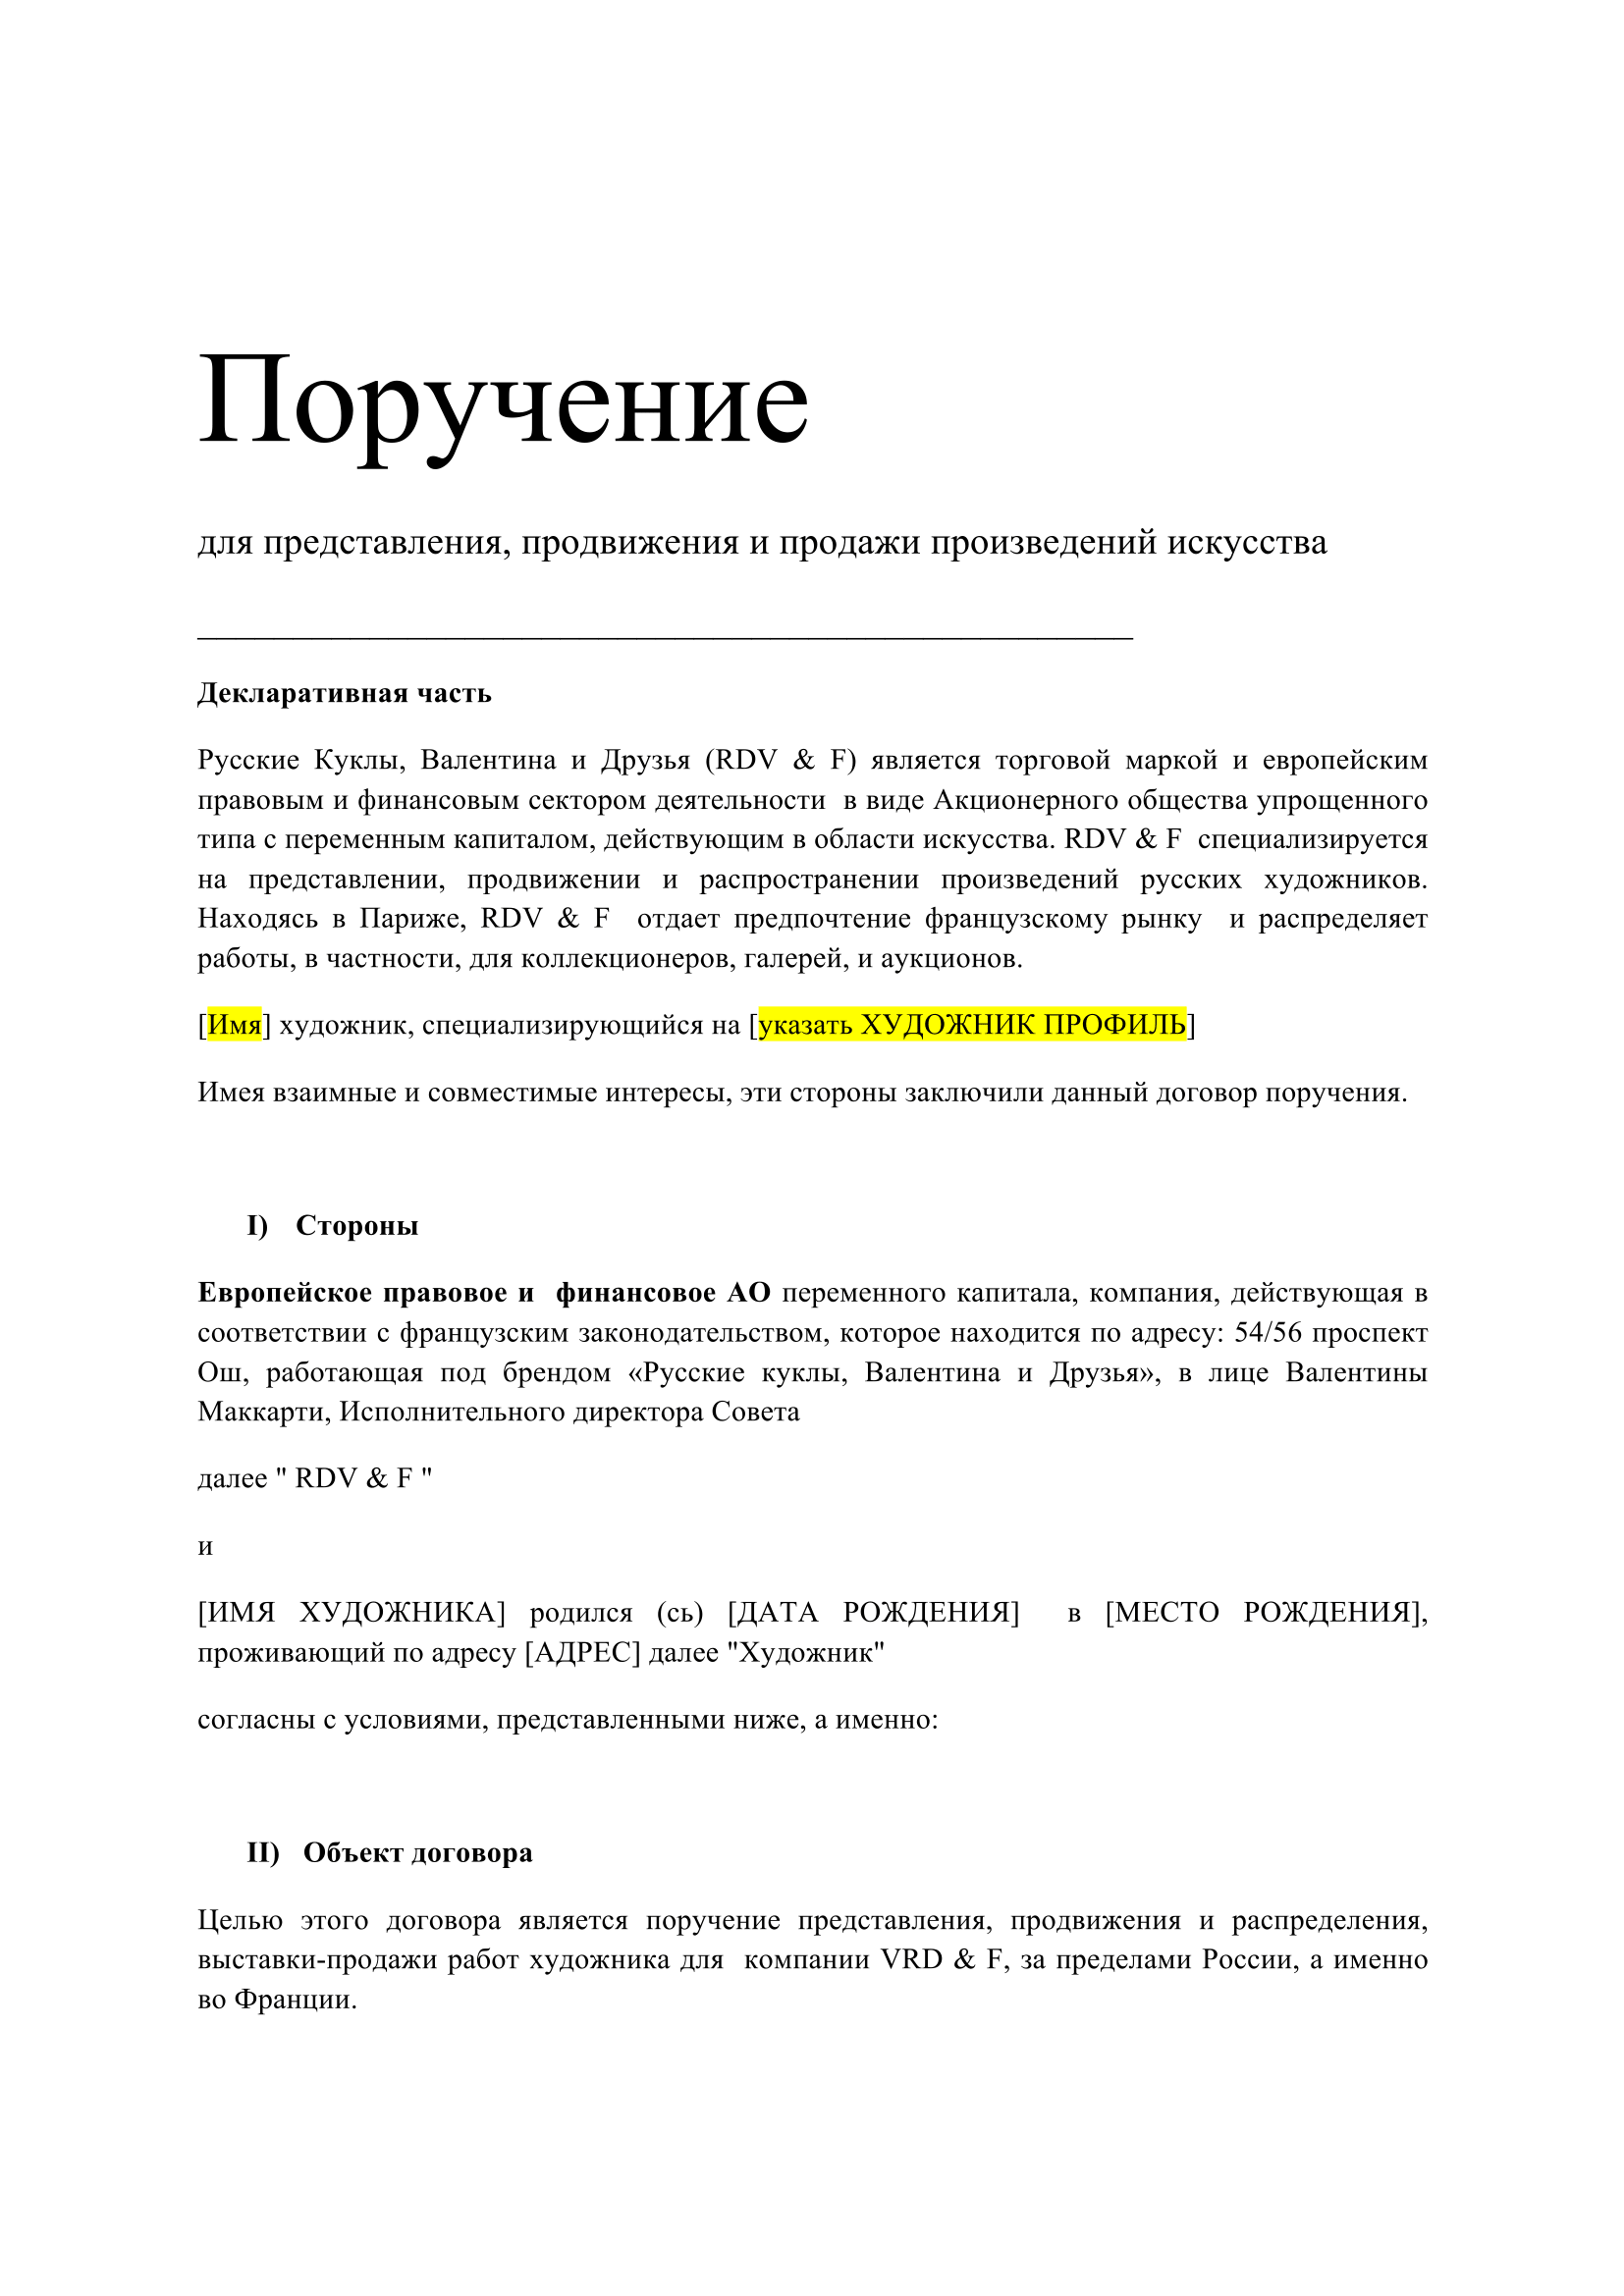 Mandat - Artistes - VRD_F - ру-1